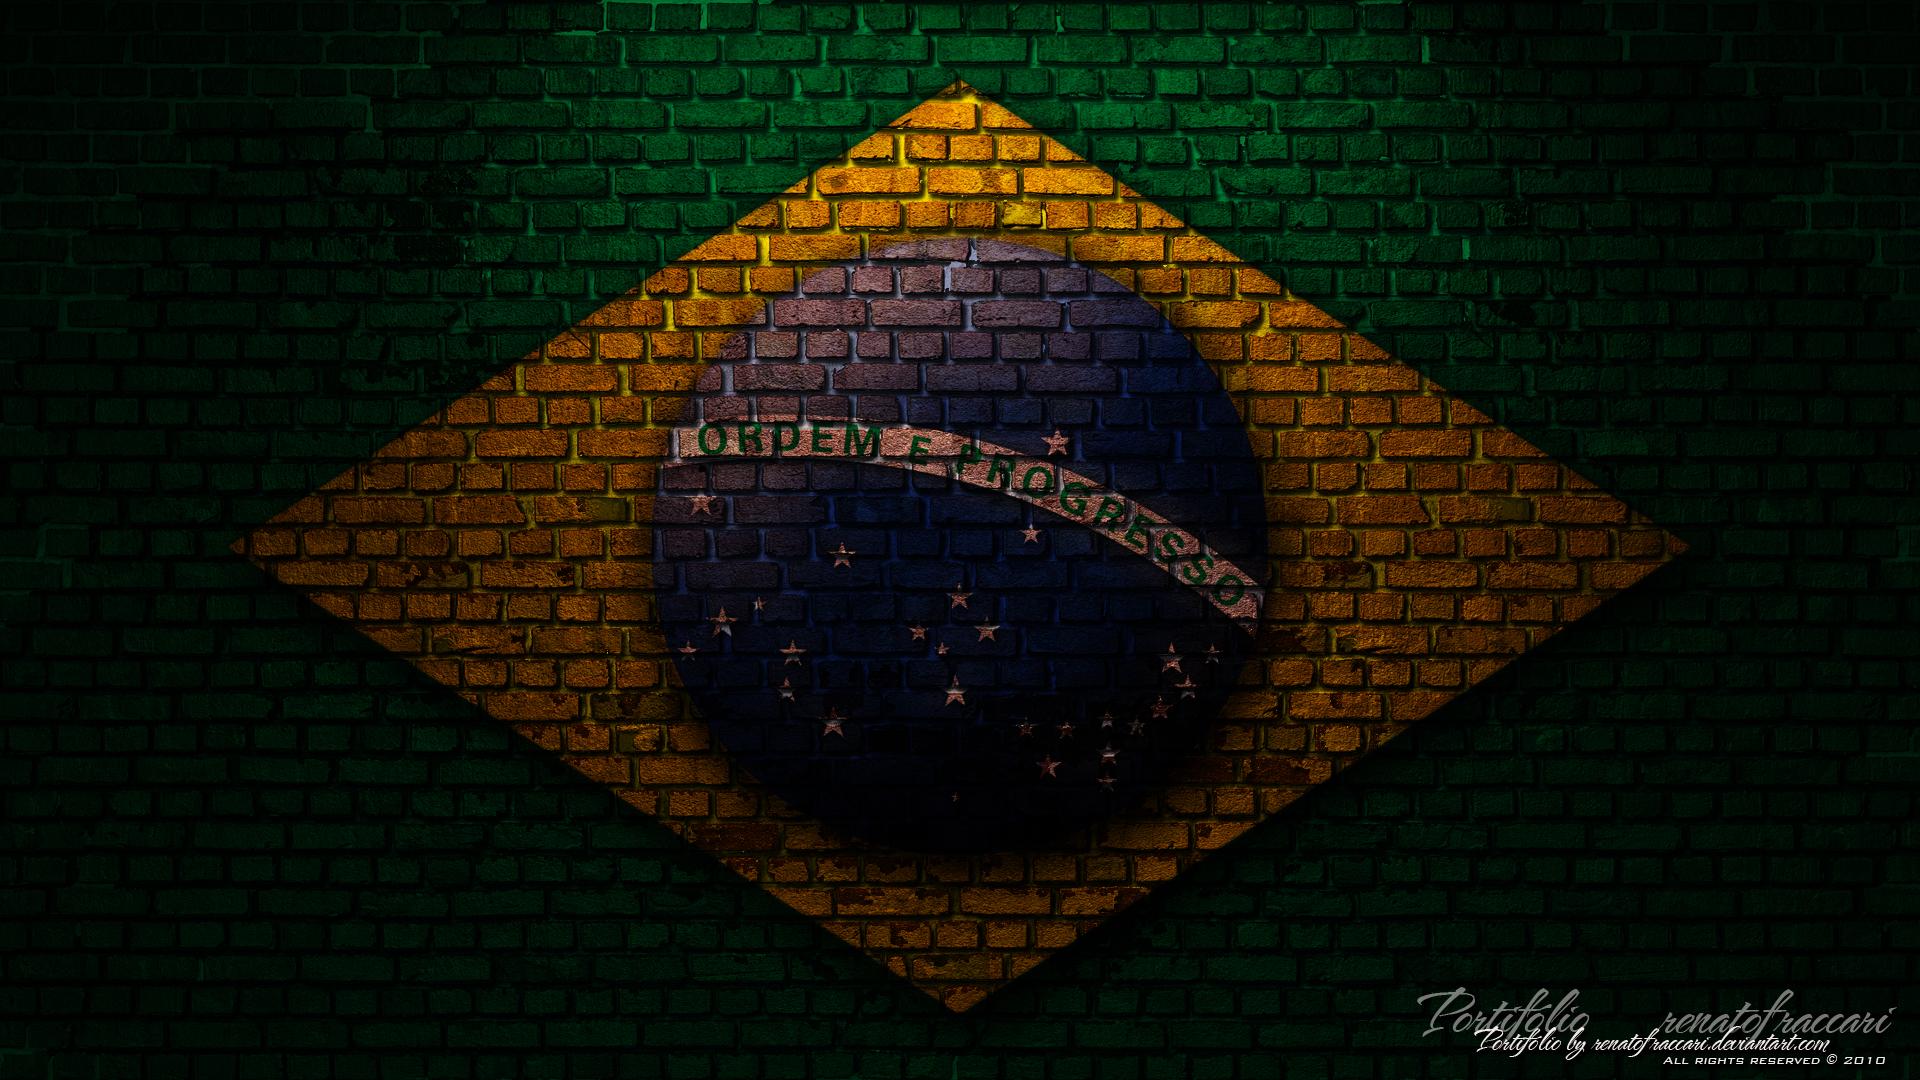 Brasil Wall by renatofraccari